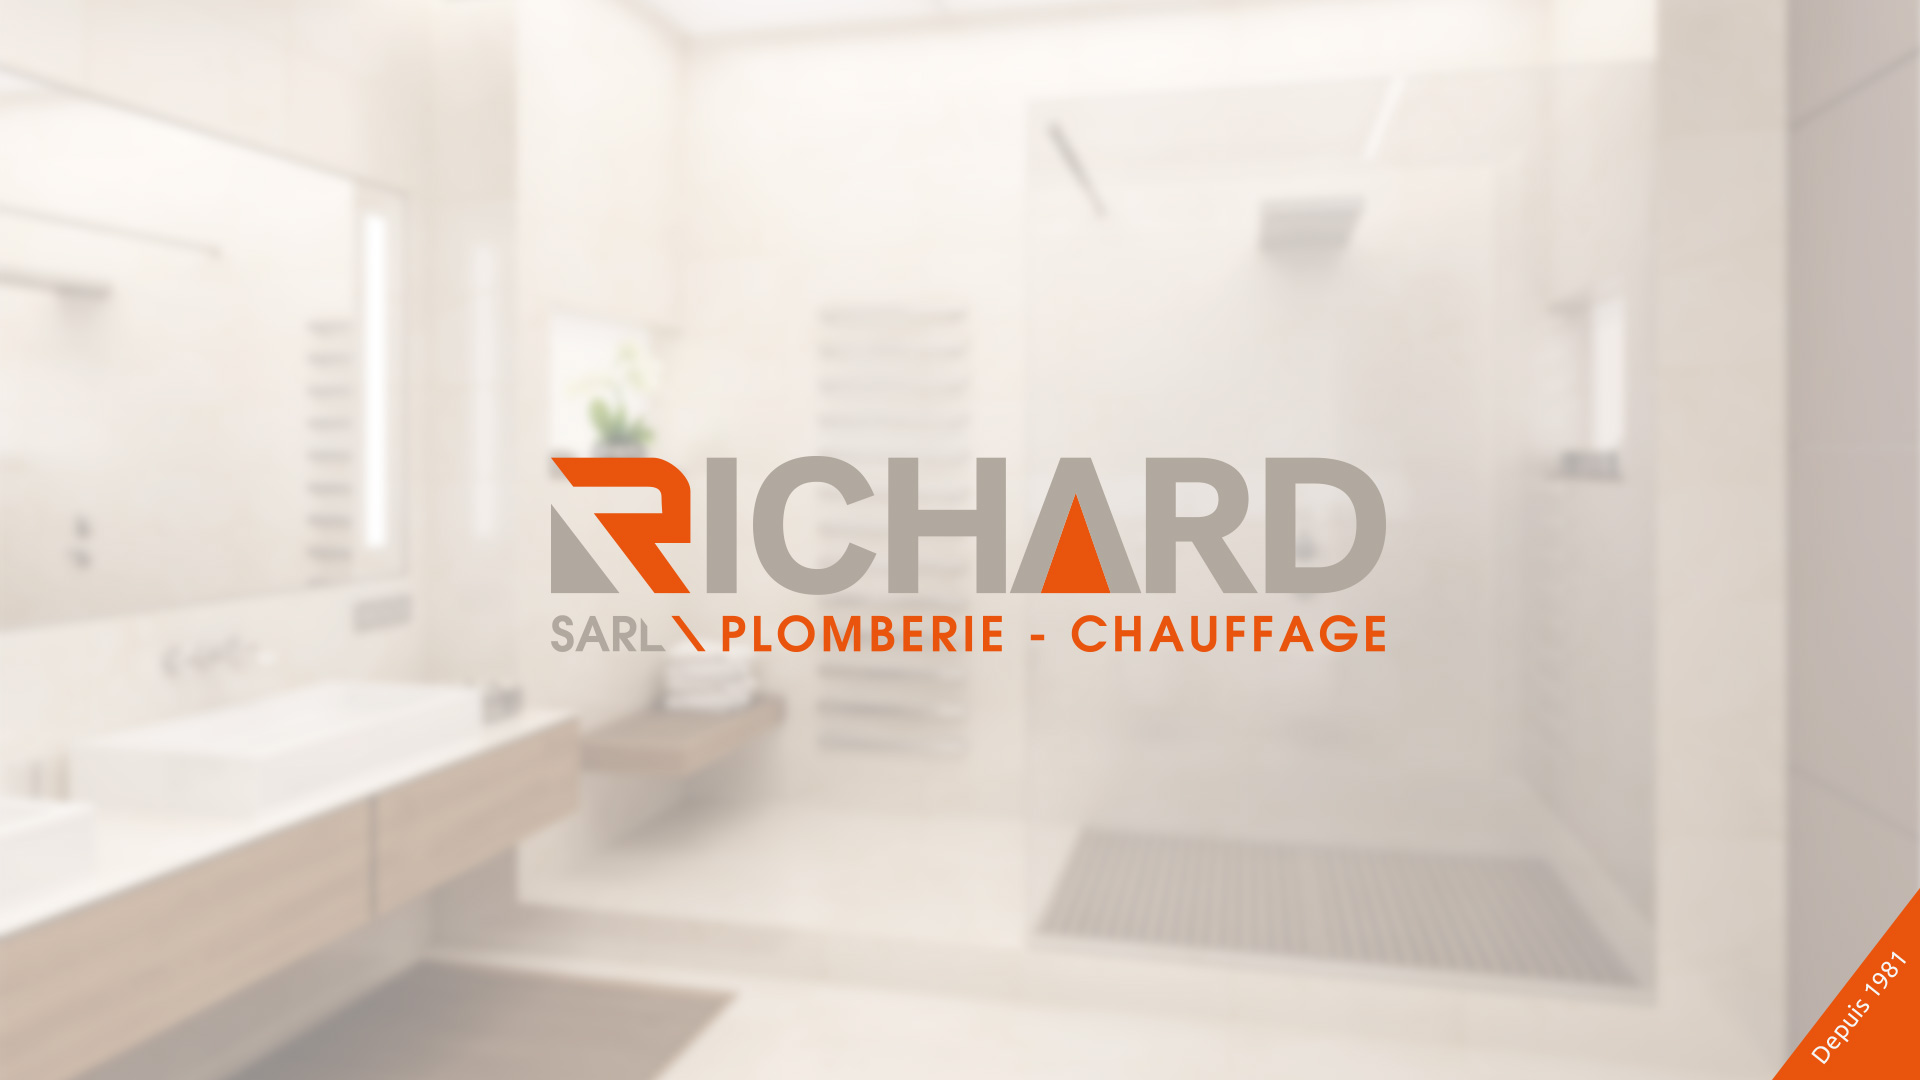 Richard SARL